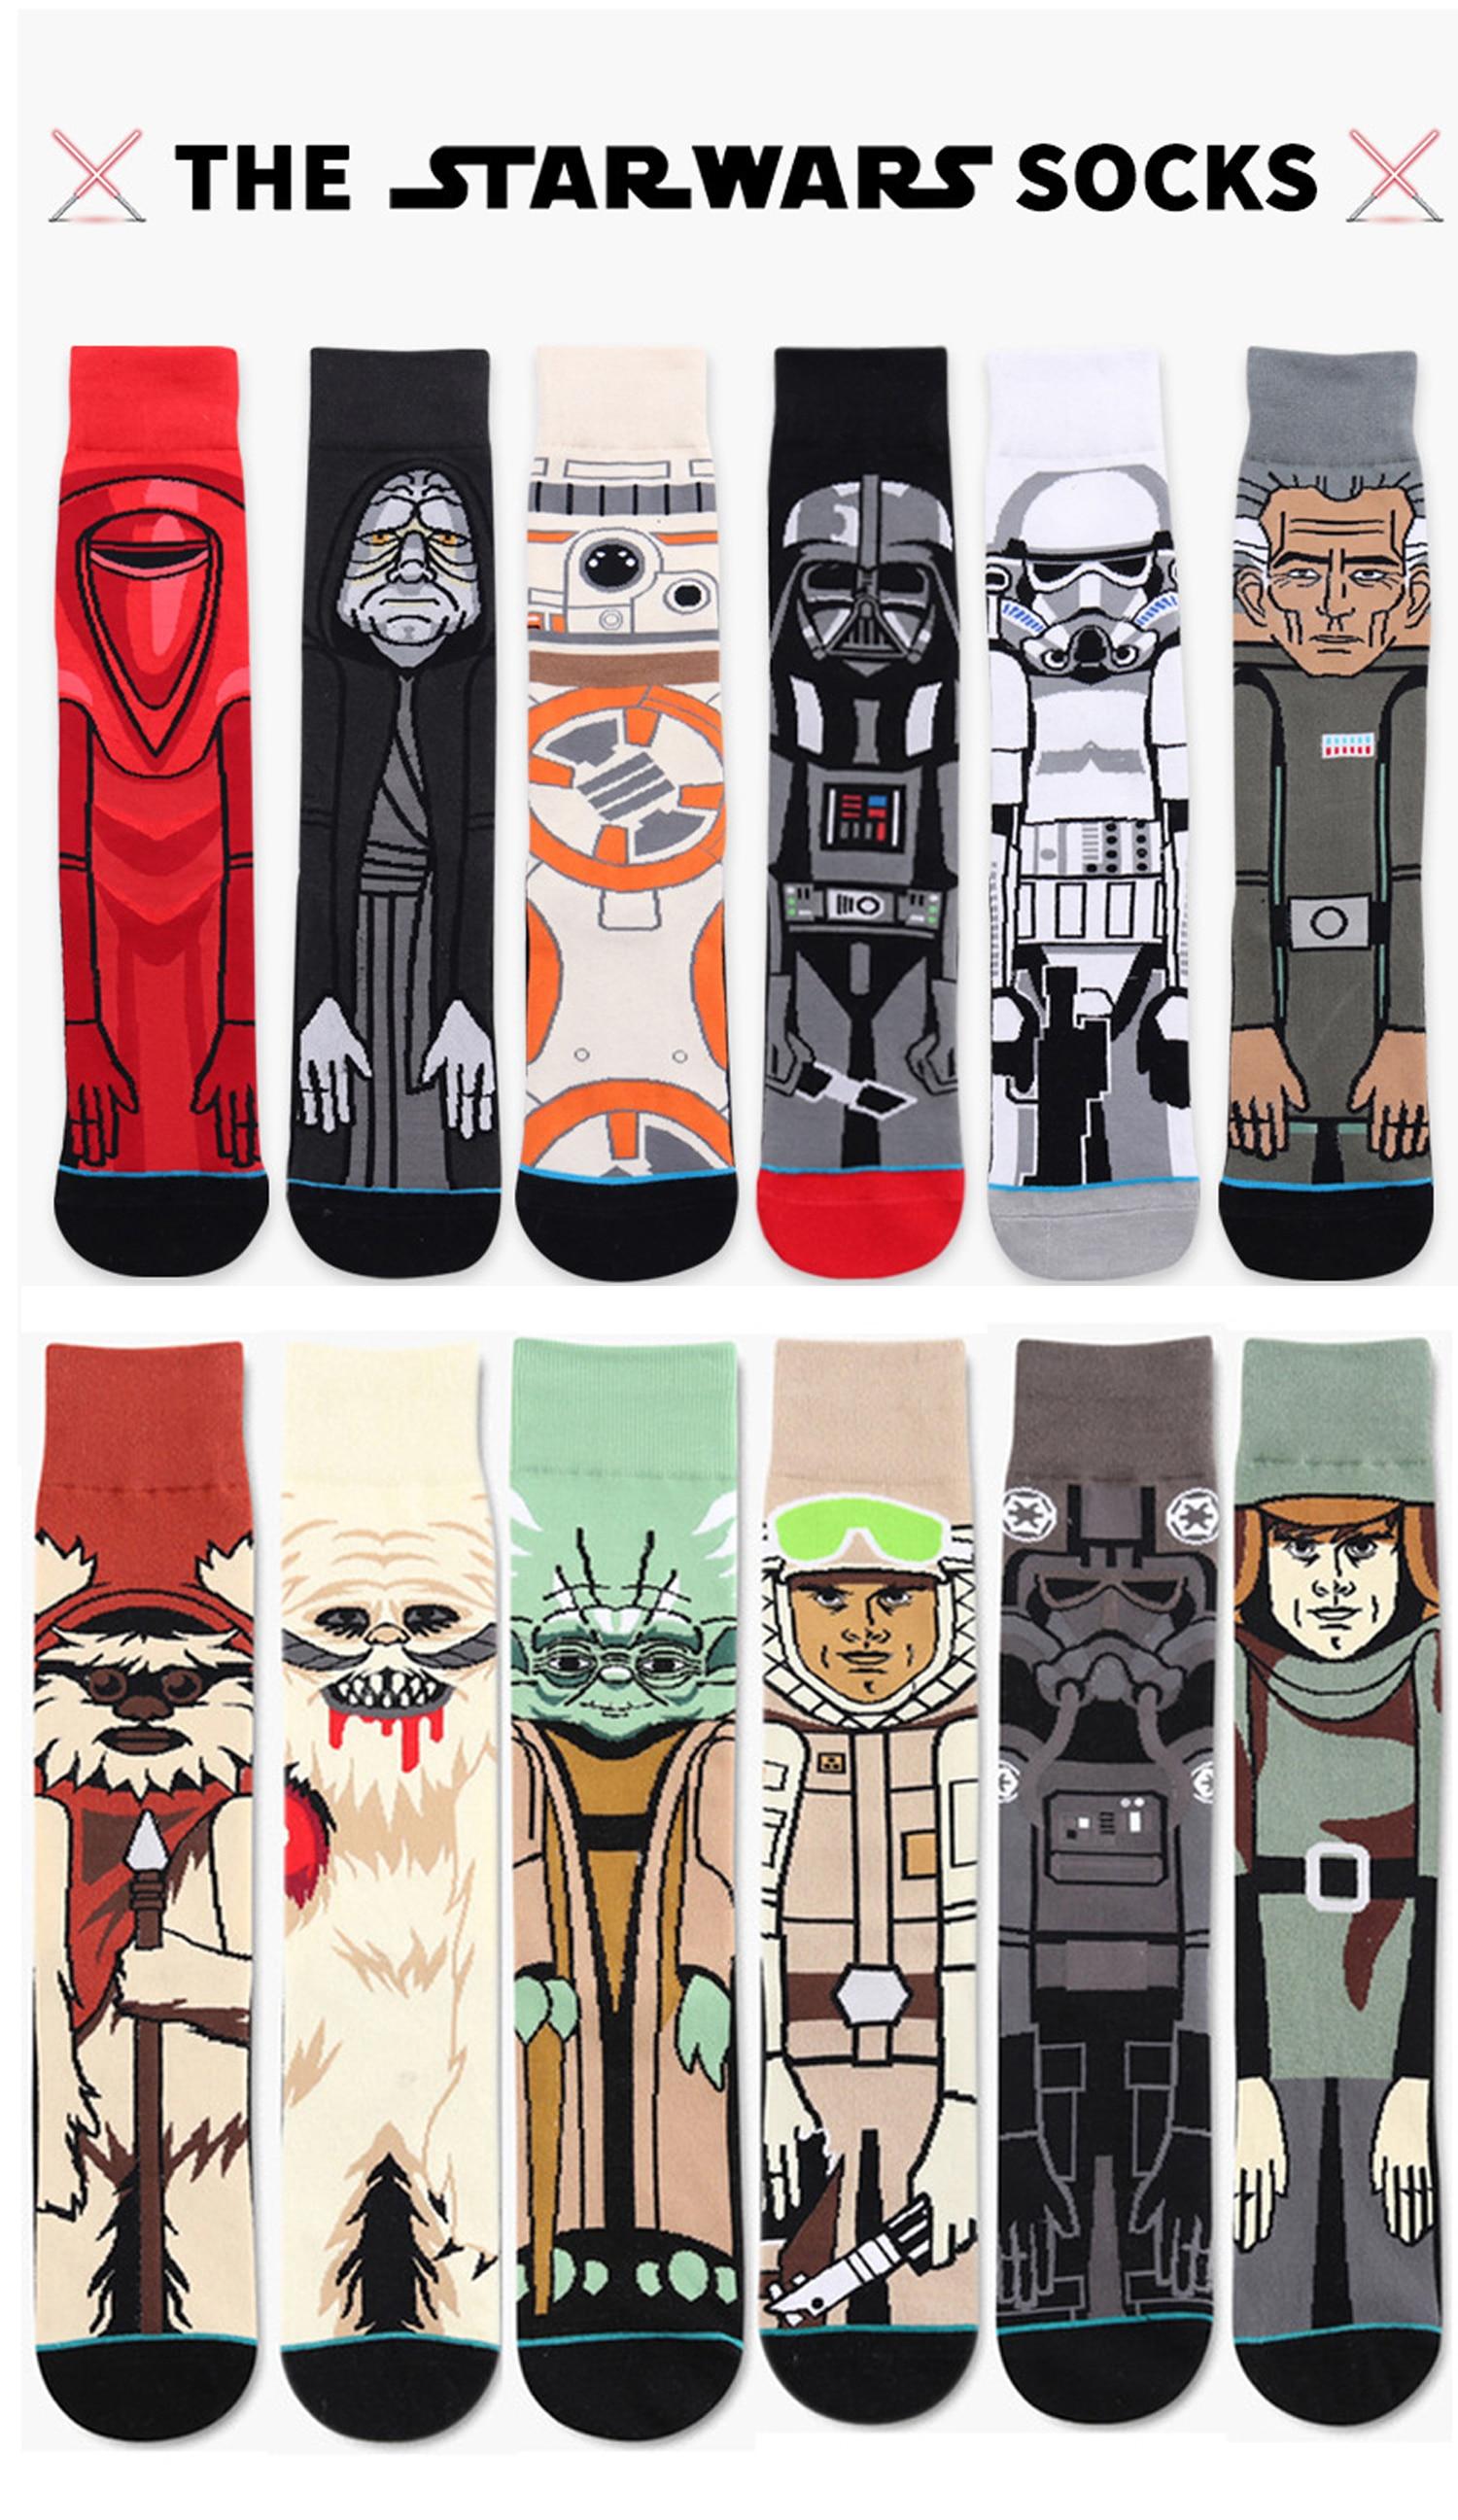 HIMEALAVO 2018 Star Wars Sale Hot Autumn And Winter New Cartoon Funny Men Socks Stockings Planet Battle Vader Socks